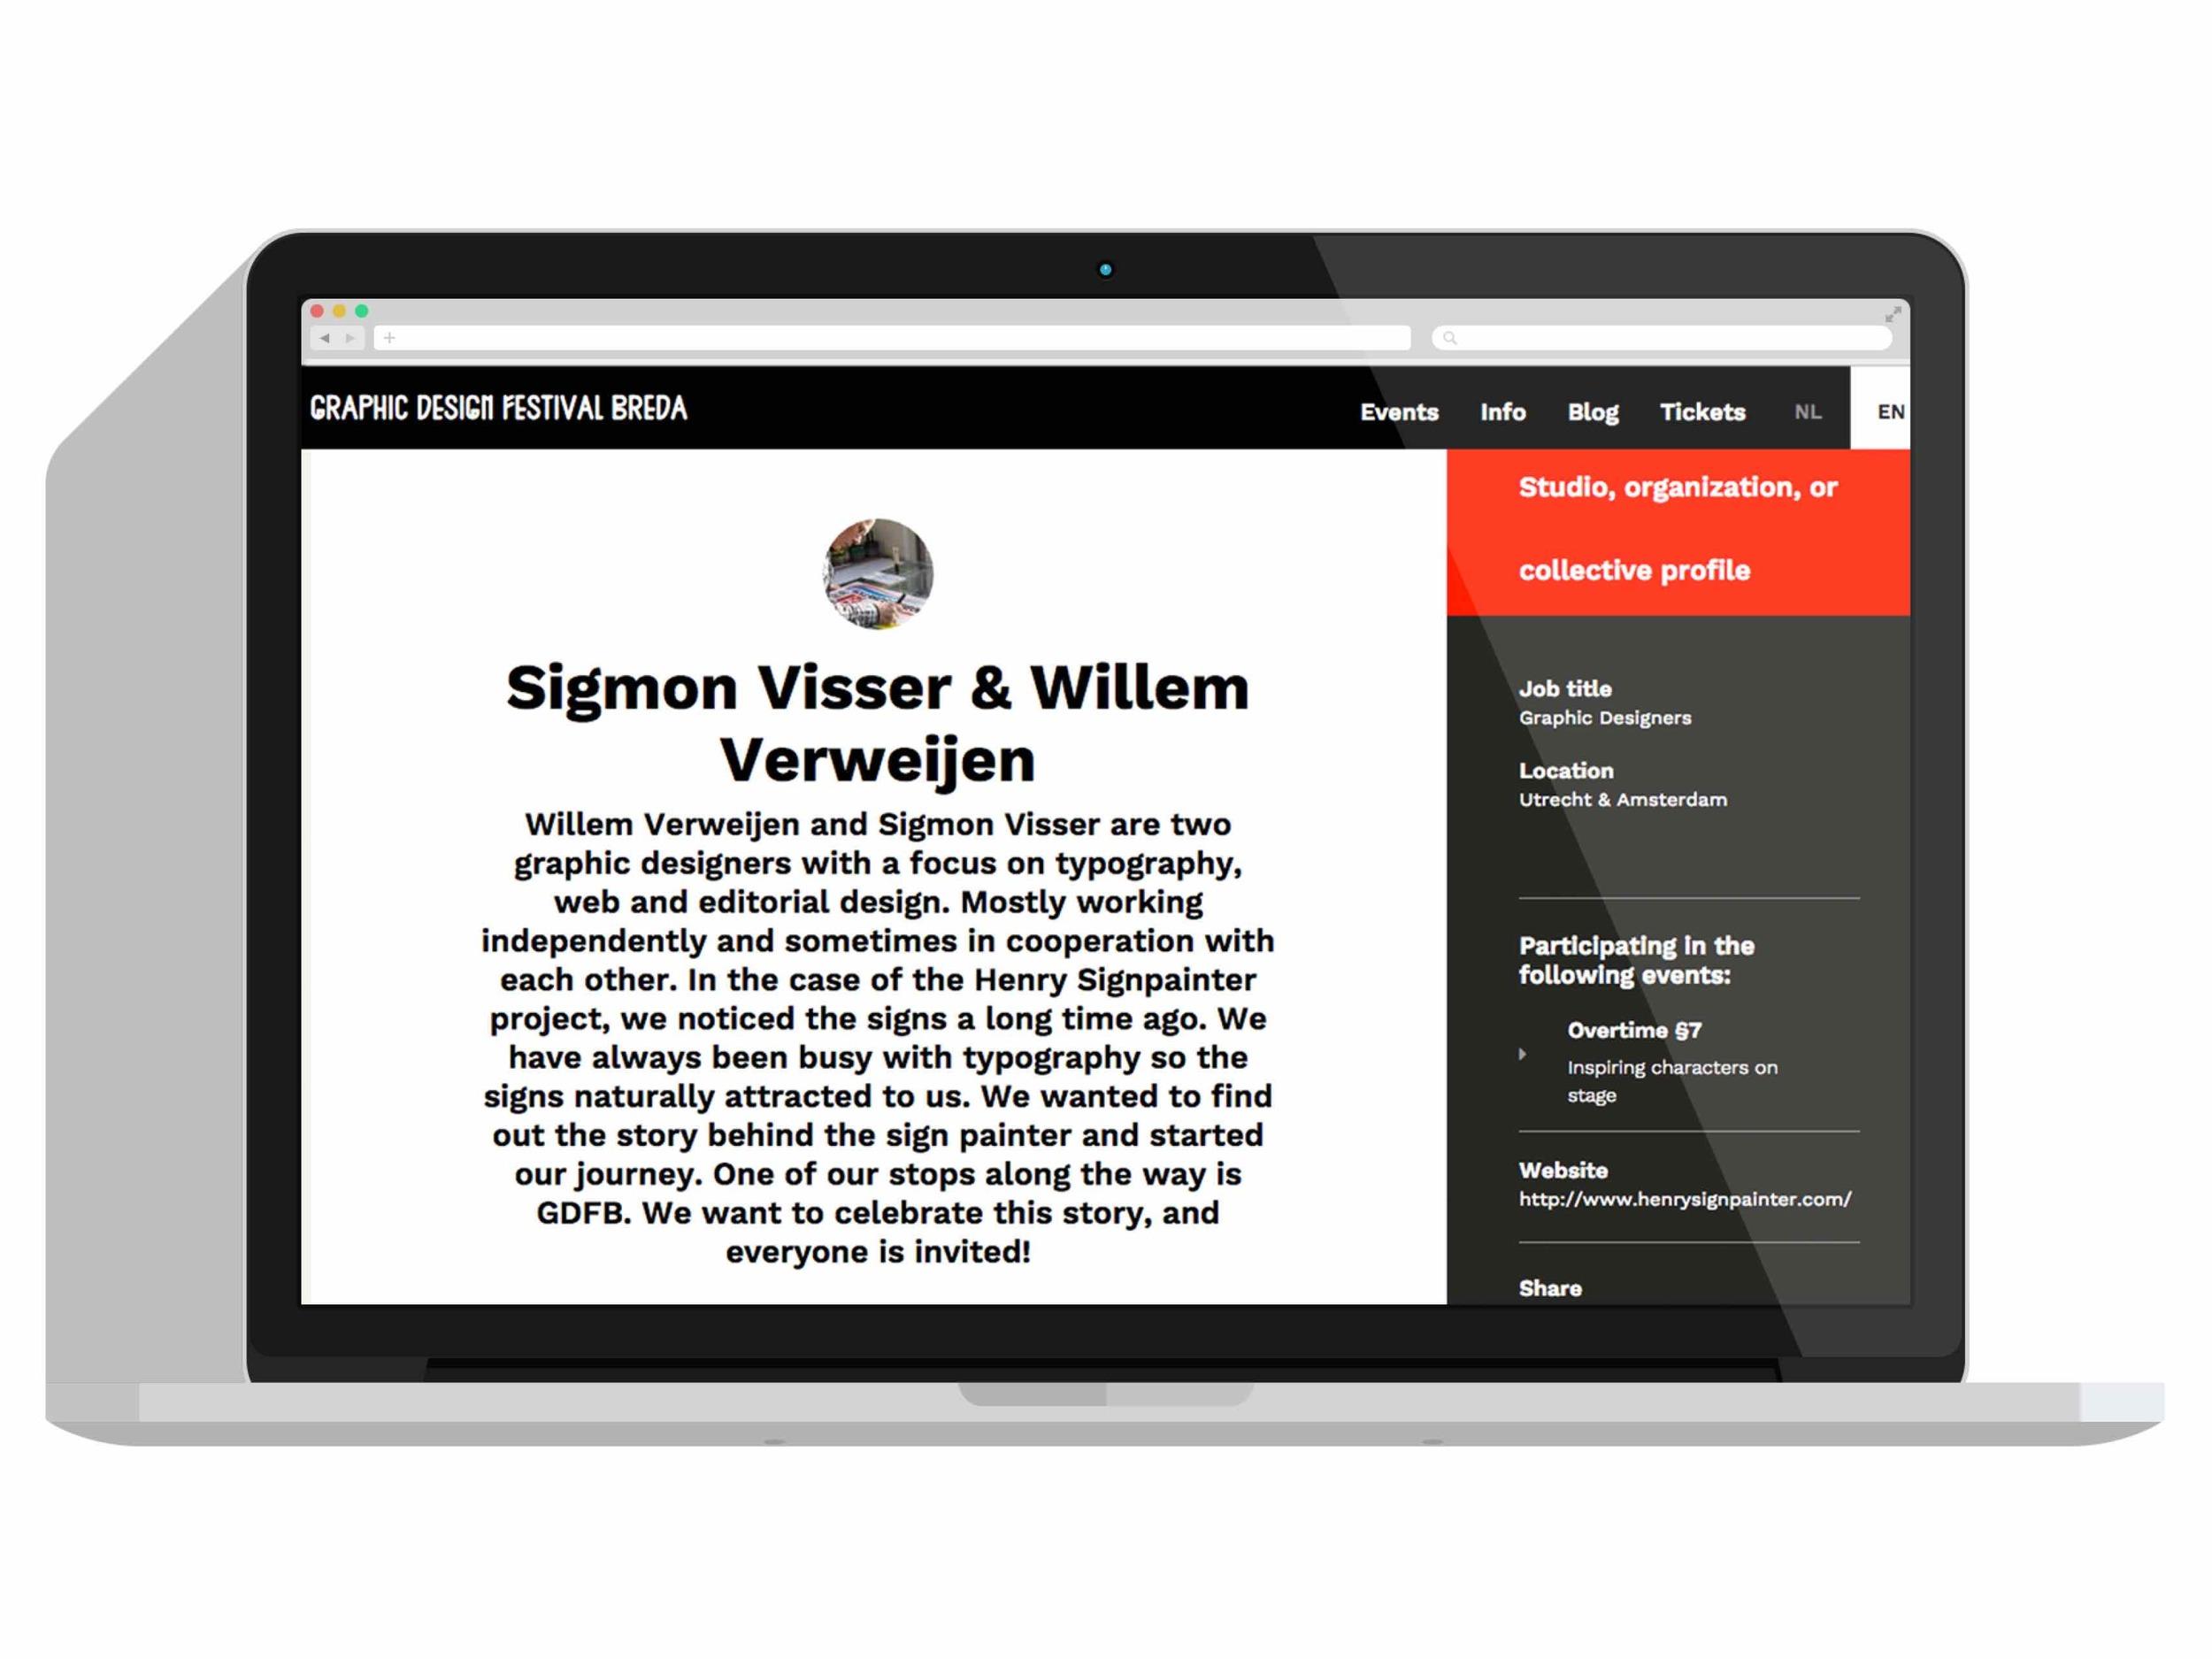 studio_sigmon_henry_sign_painter_graphic_design_festival_breda